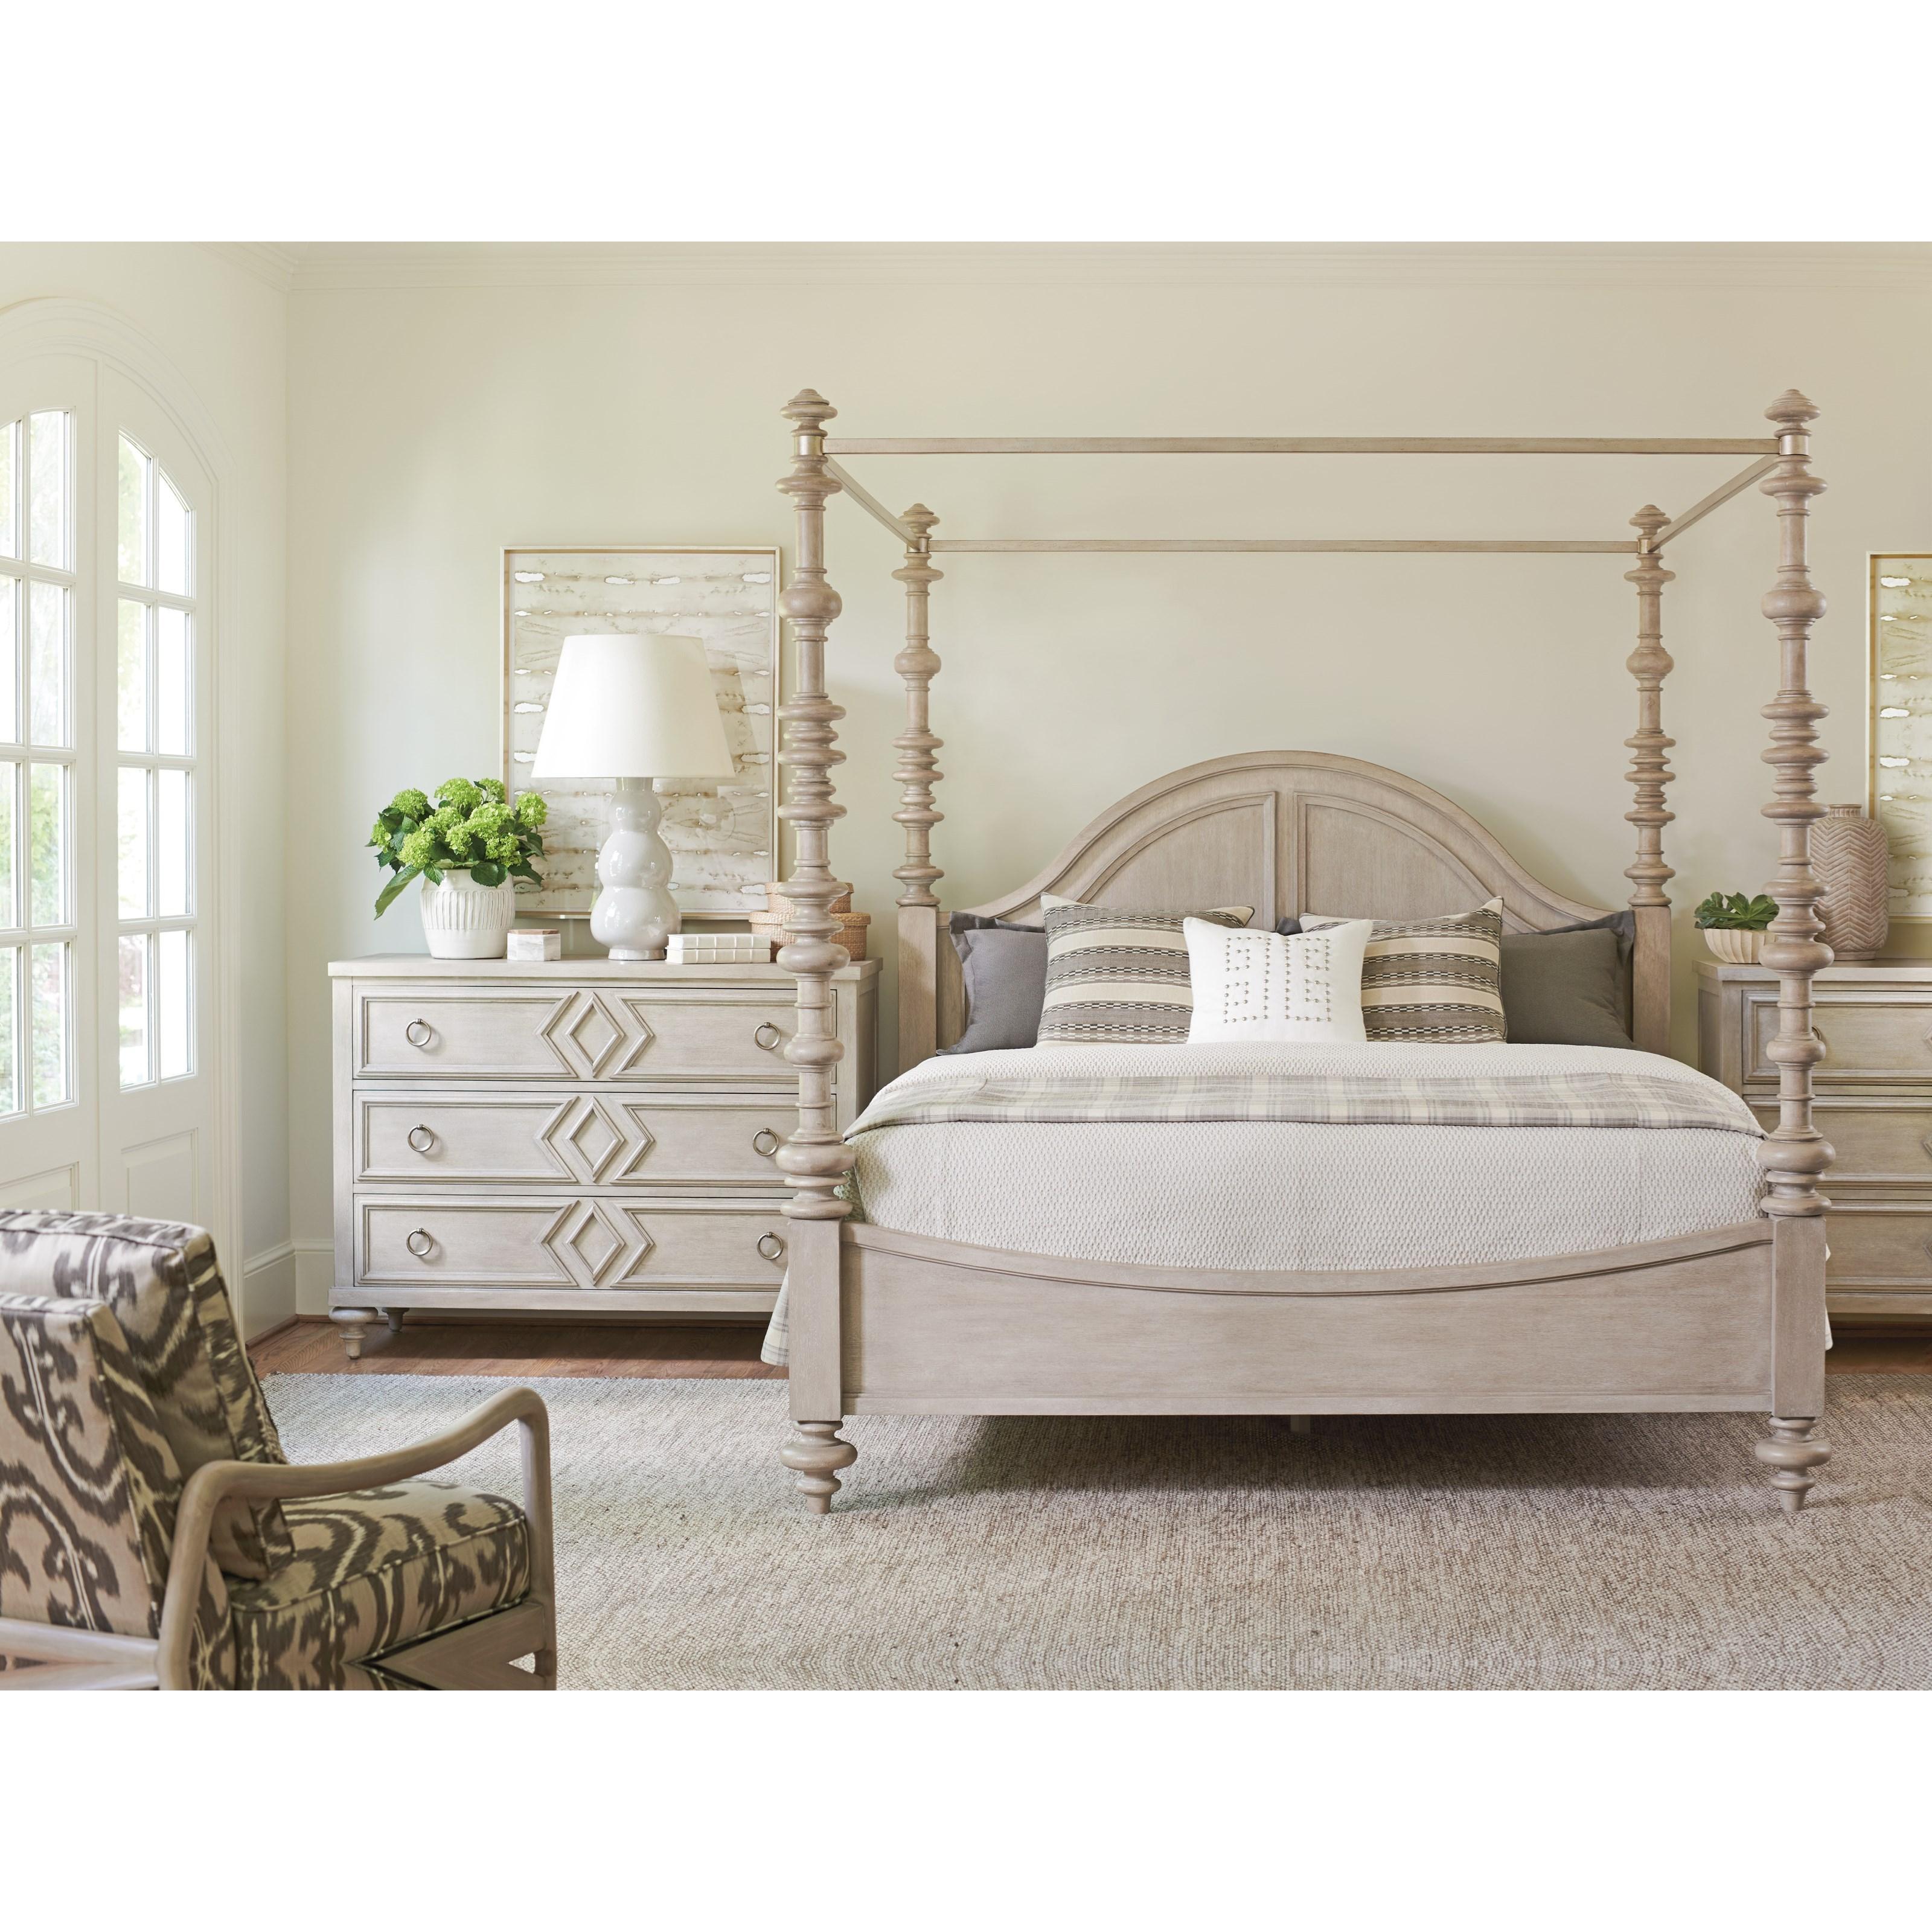 Malibu King Bedroom Group by Barclay Butera at Baer's Furniture